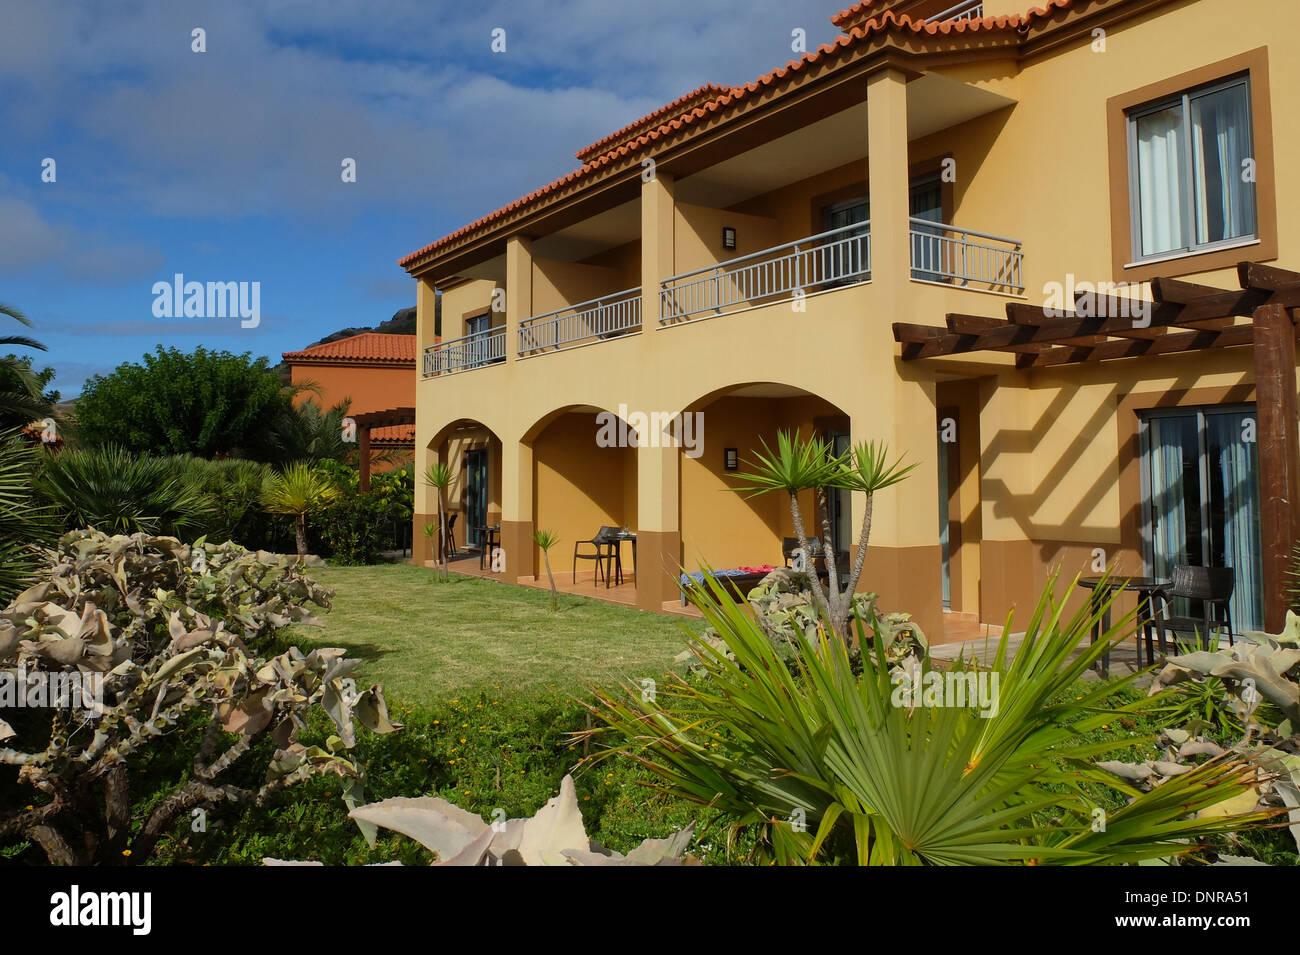 The Pestana Hotel Porto Santo near Madeira Europe - Stock Image